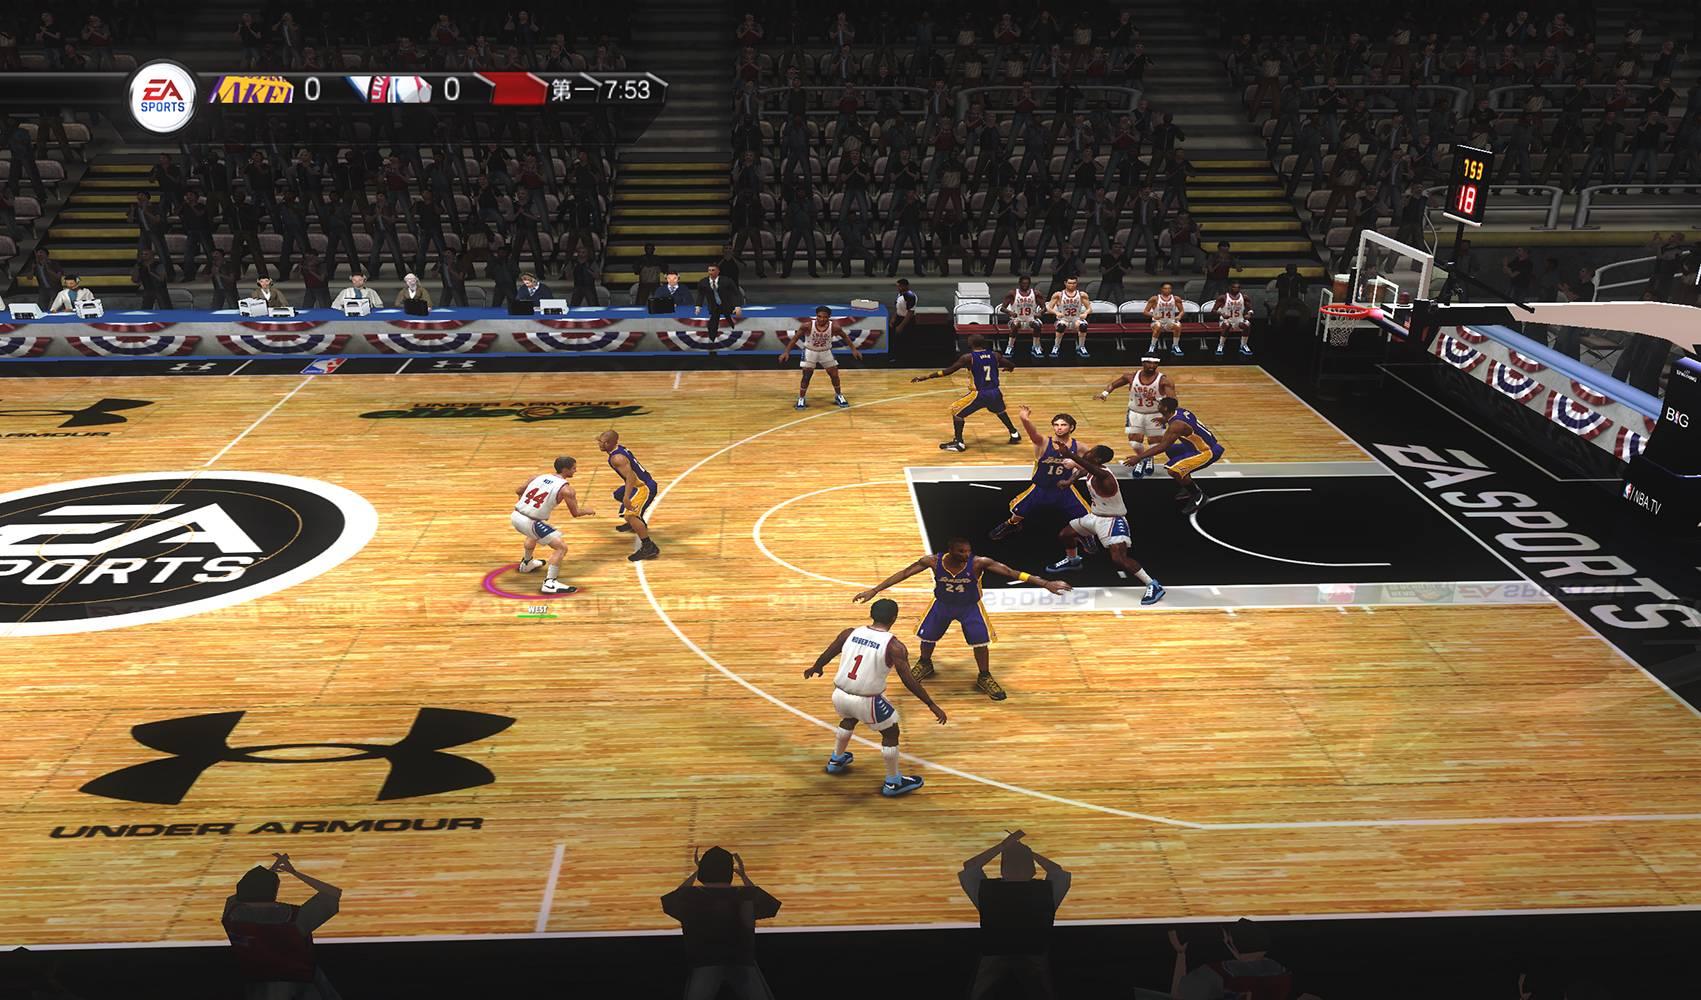 NBA LIVE 08【2K】-2021-03-31-01-20-29-909副本.jpg